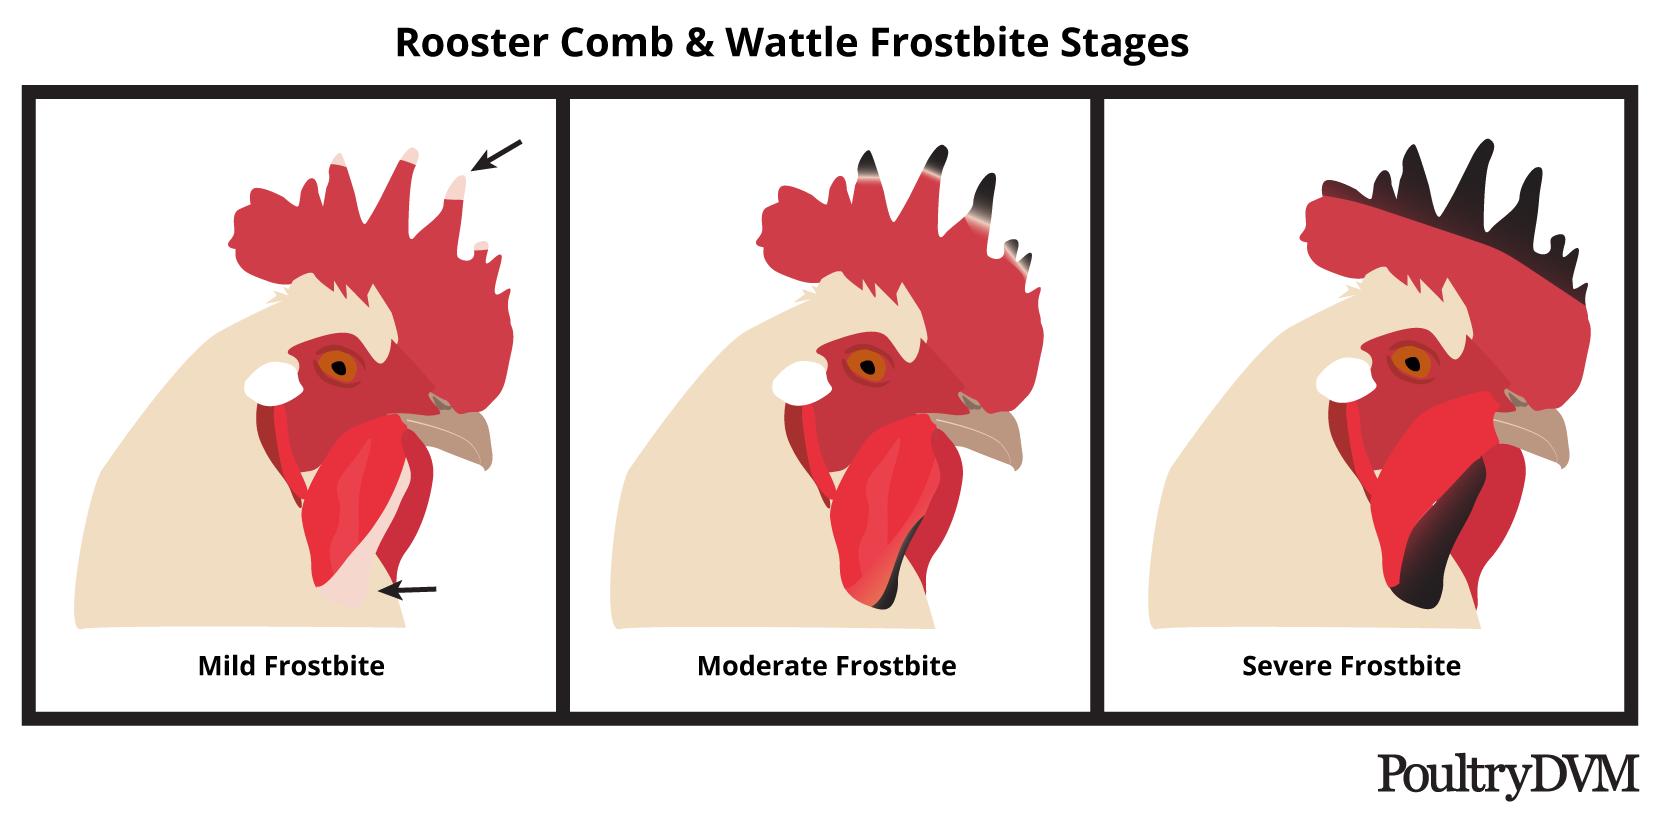 poultrydvm-rooster-comb-frostbite-stages.png